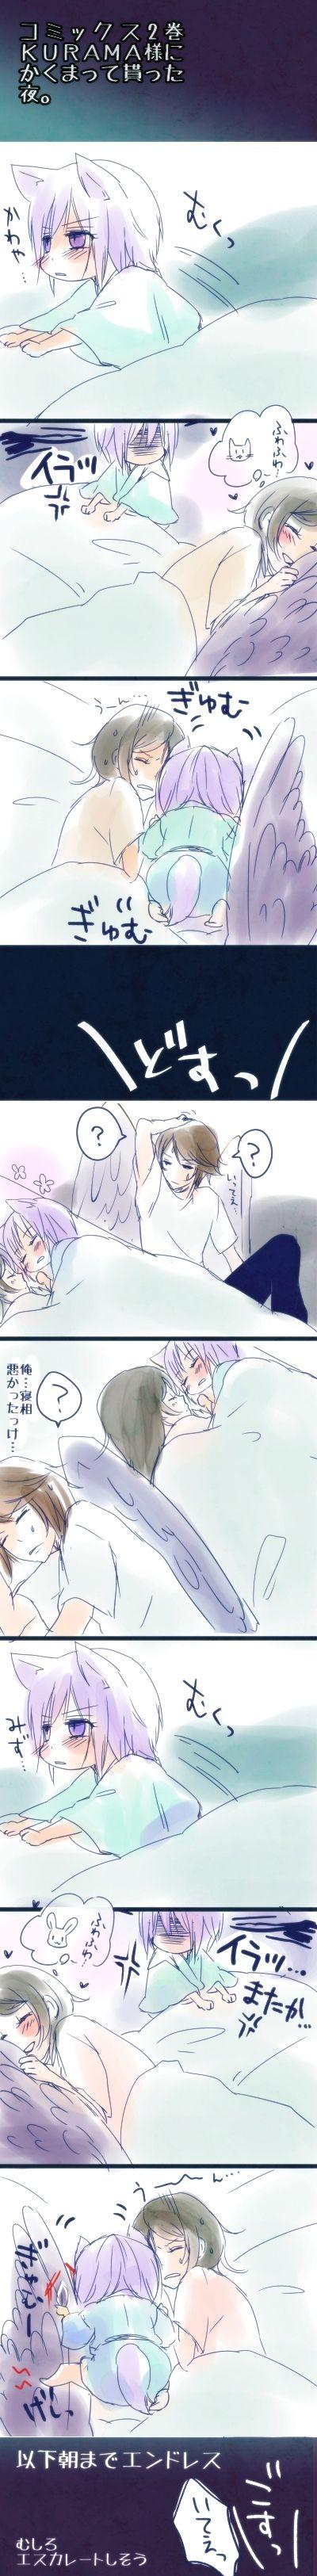 I don't understand what's written, but it looks so adorable!!! -- Anime, Kamisama Hajimemashita, Kamisama Kiss, fan art, comic, Tomoe and Nanami and Kurama, funny, fiction